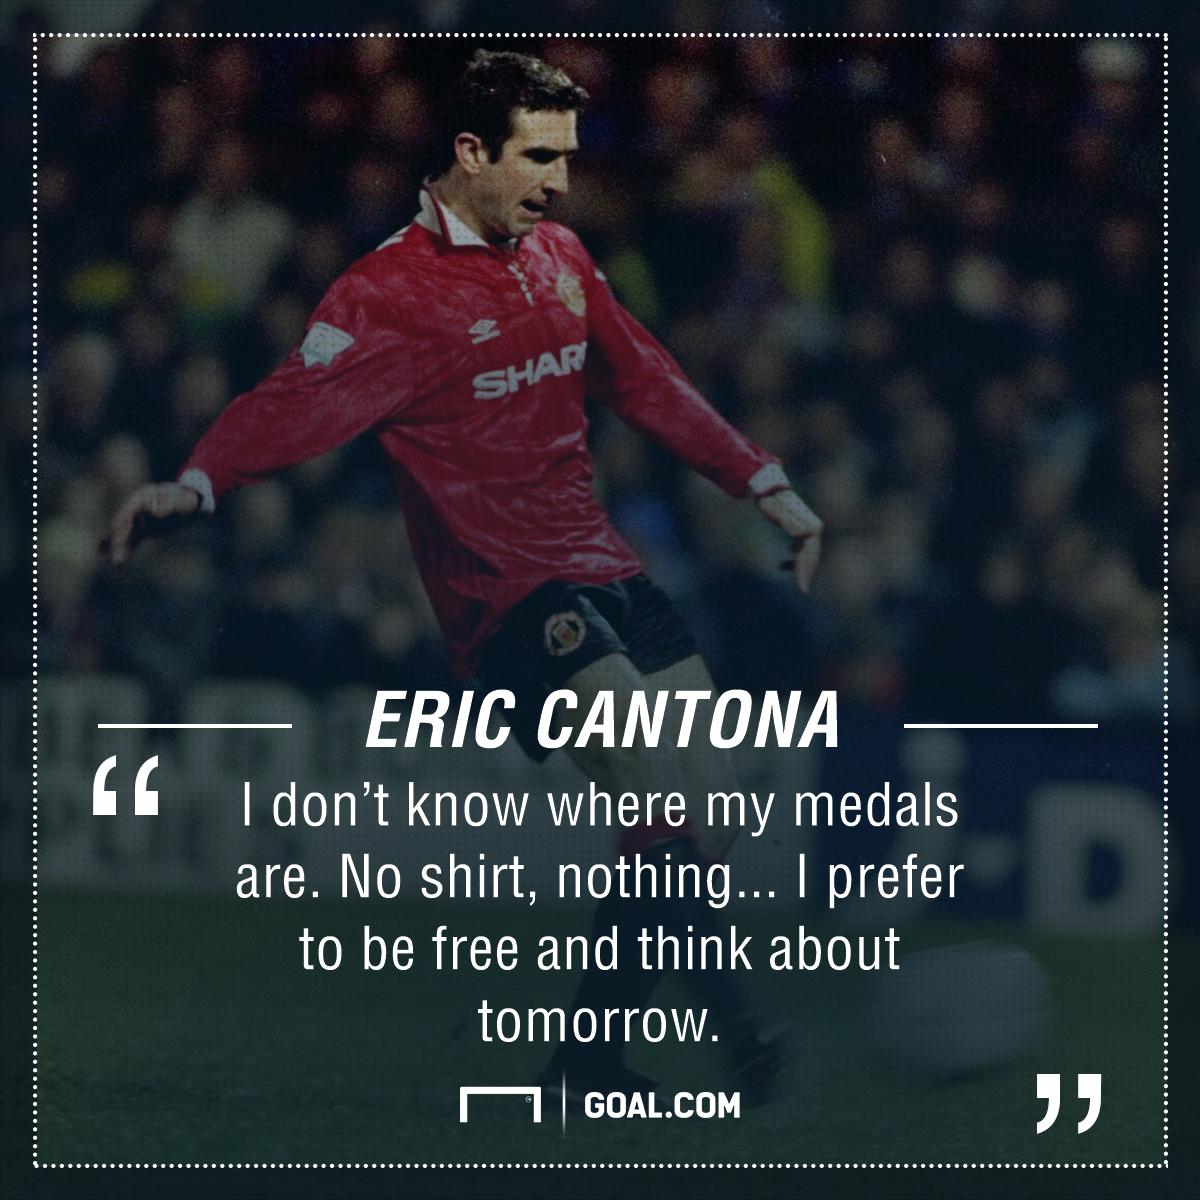 Eric Cantona quote